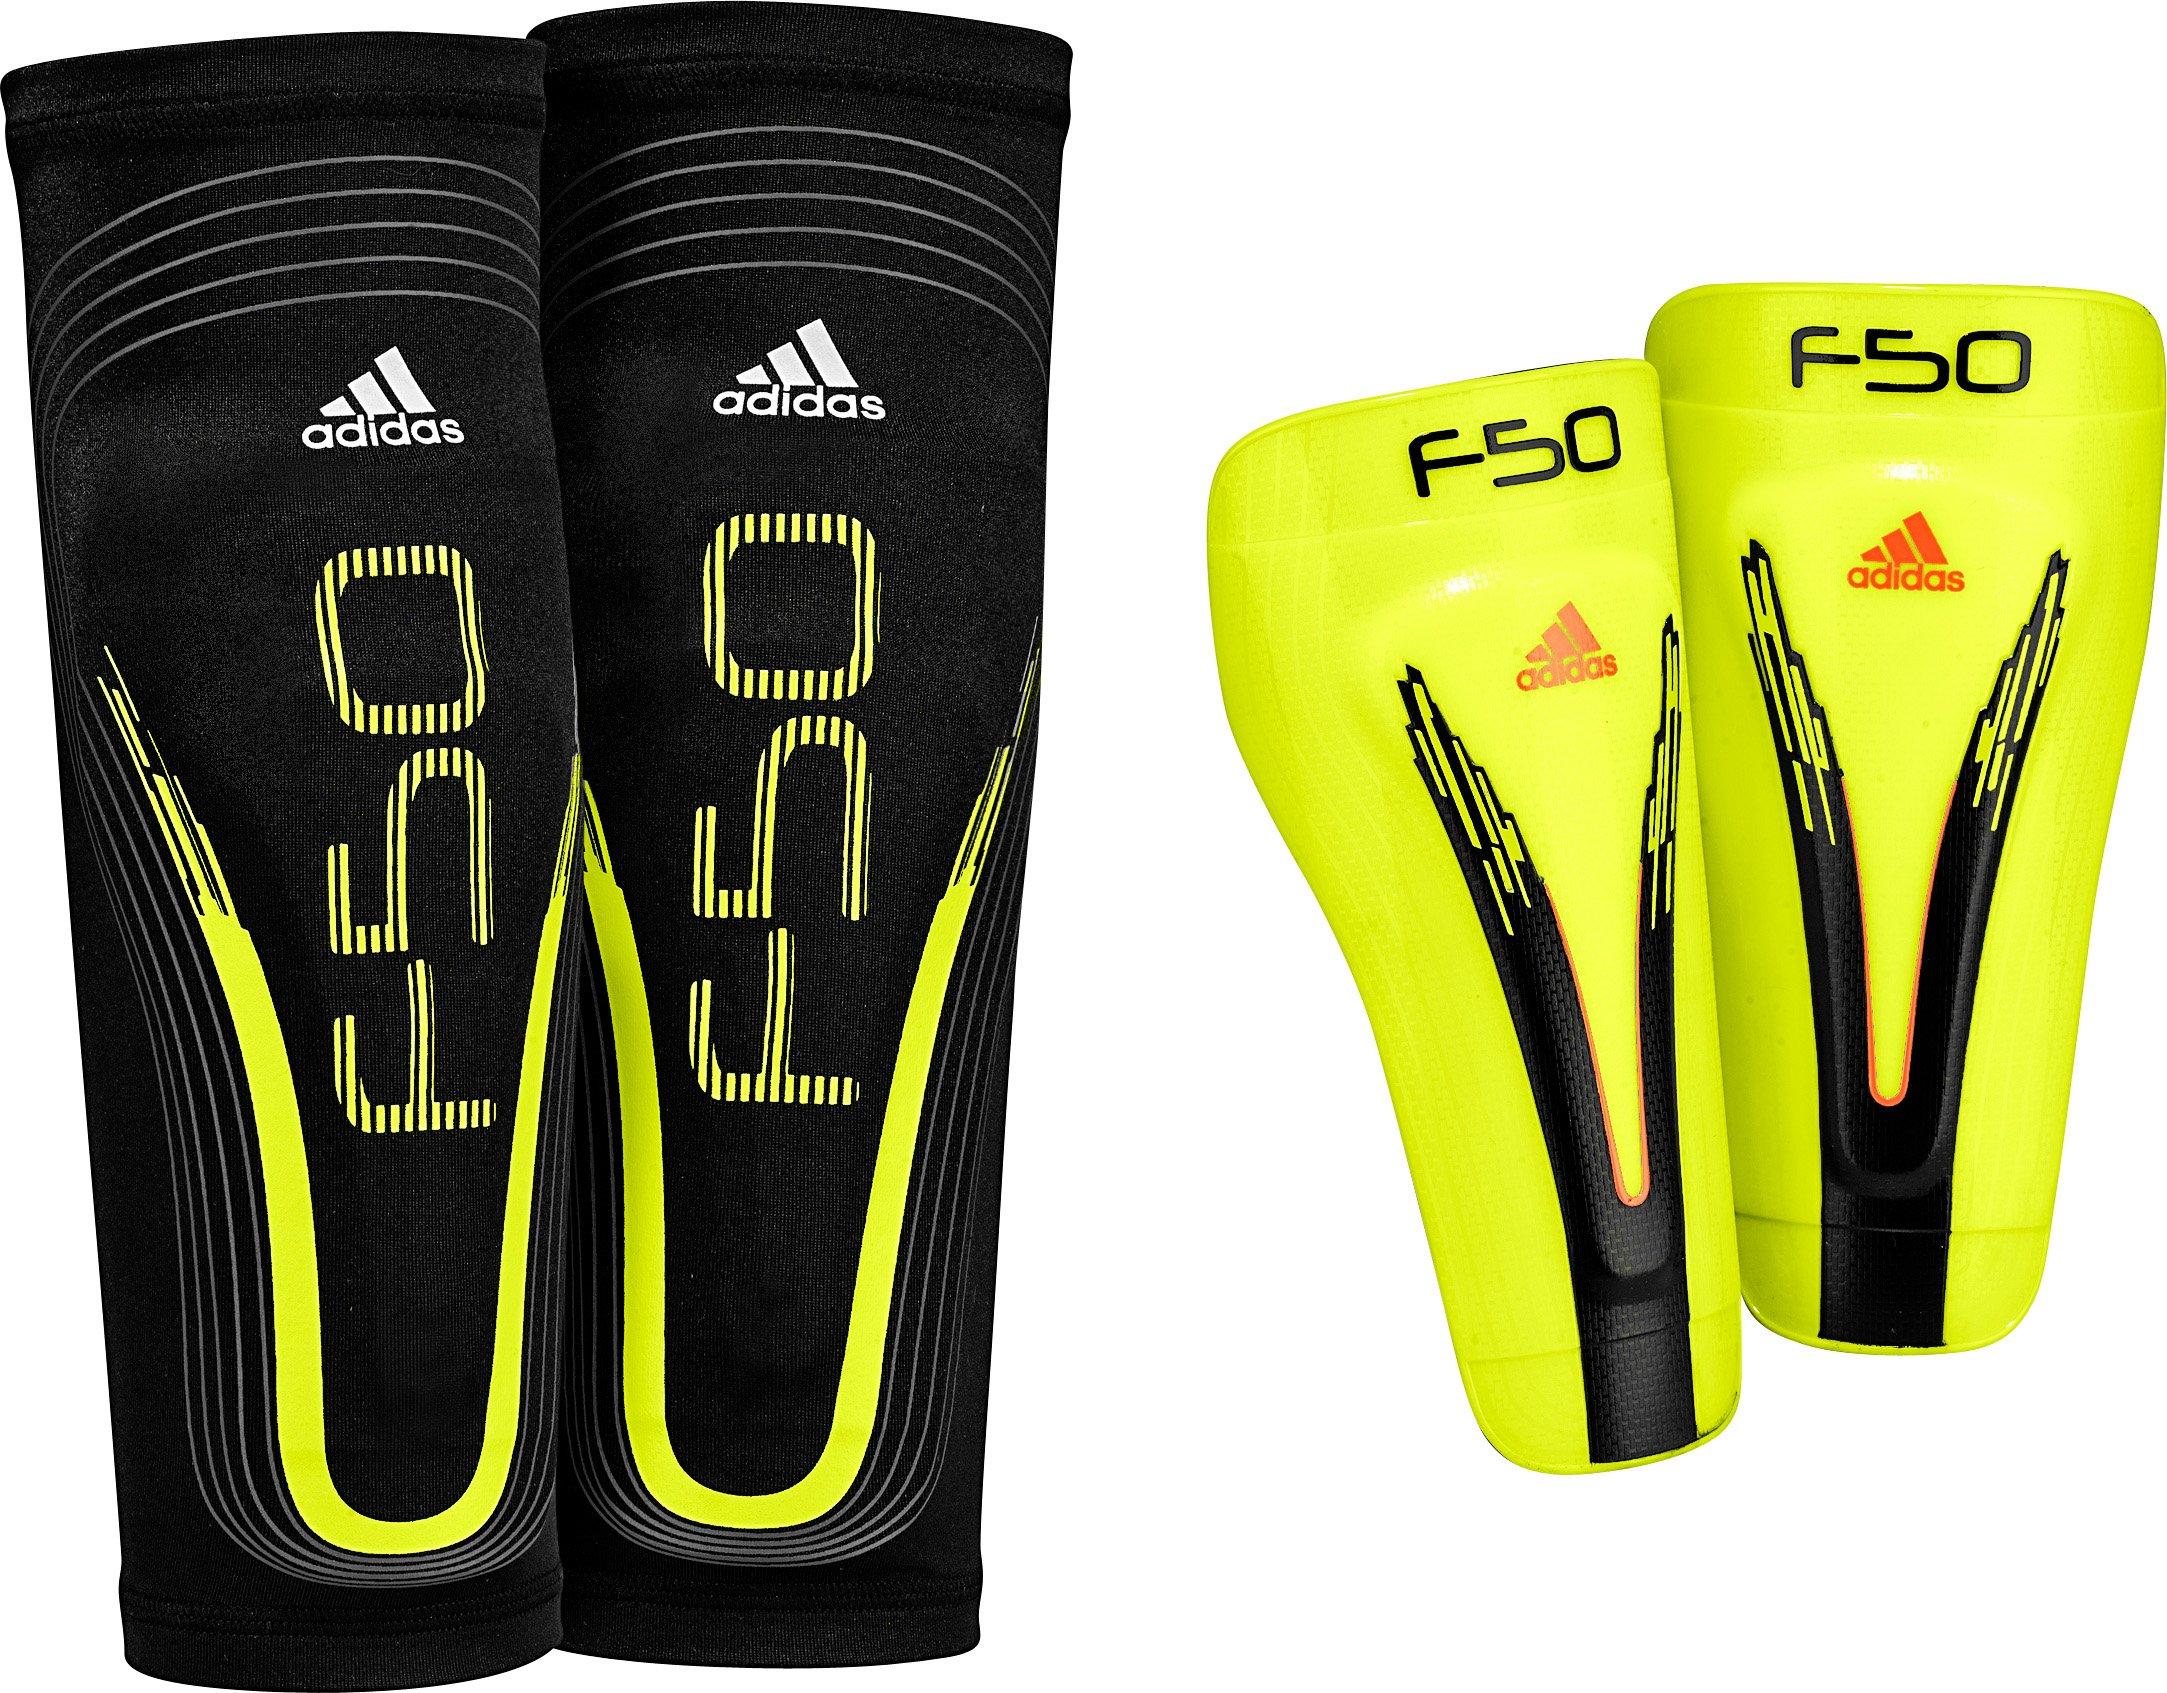 adidas F50 Pro Lite Shin Guard